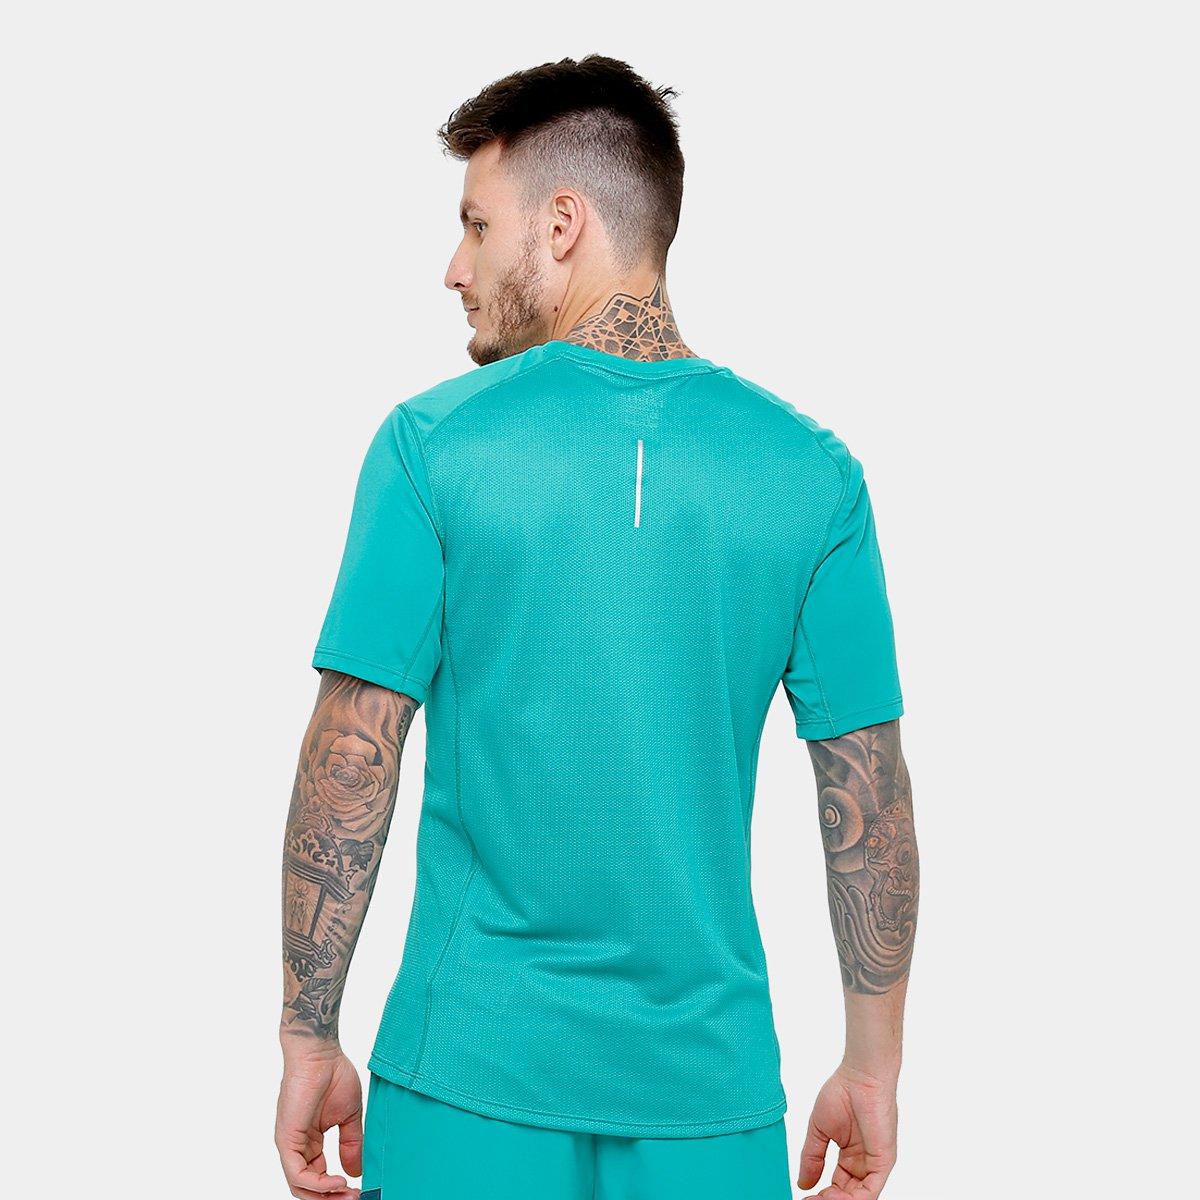 ceced9dce4 Camiseta Nike Dri-Fit Miler SS Masculina - Verde - Compre Agora ...